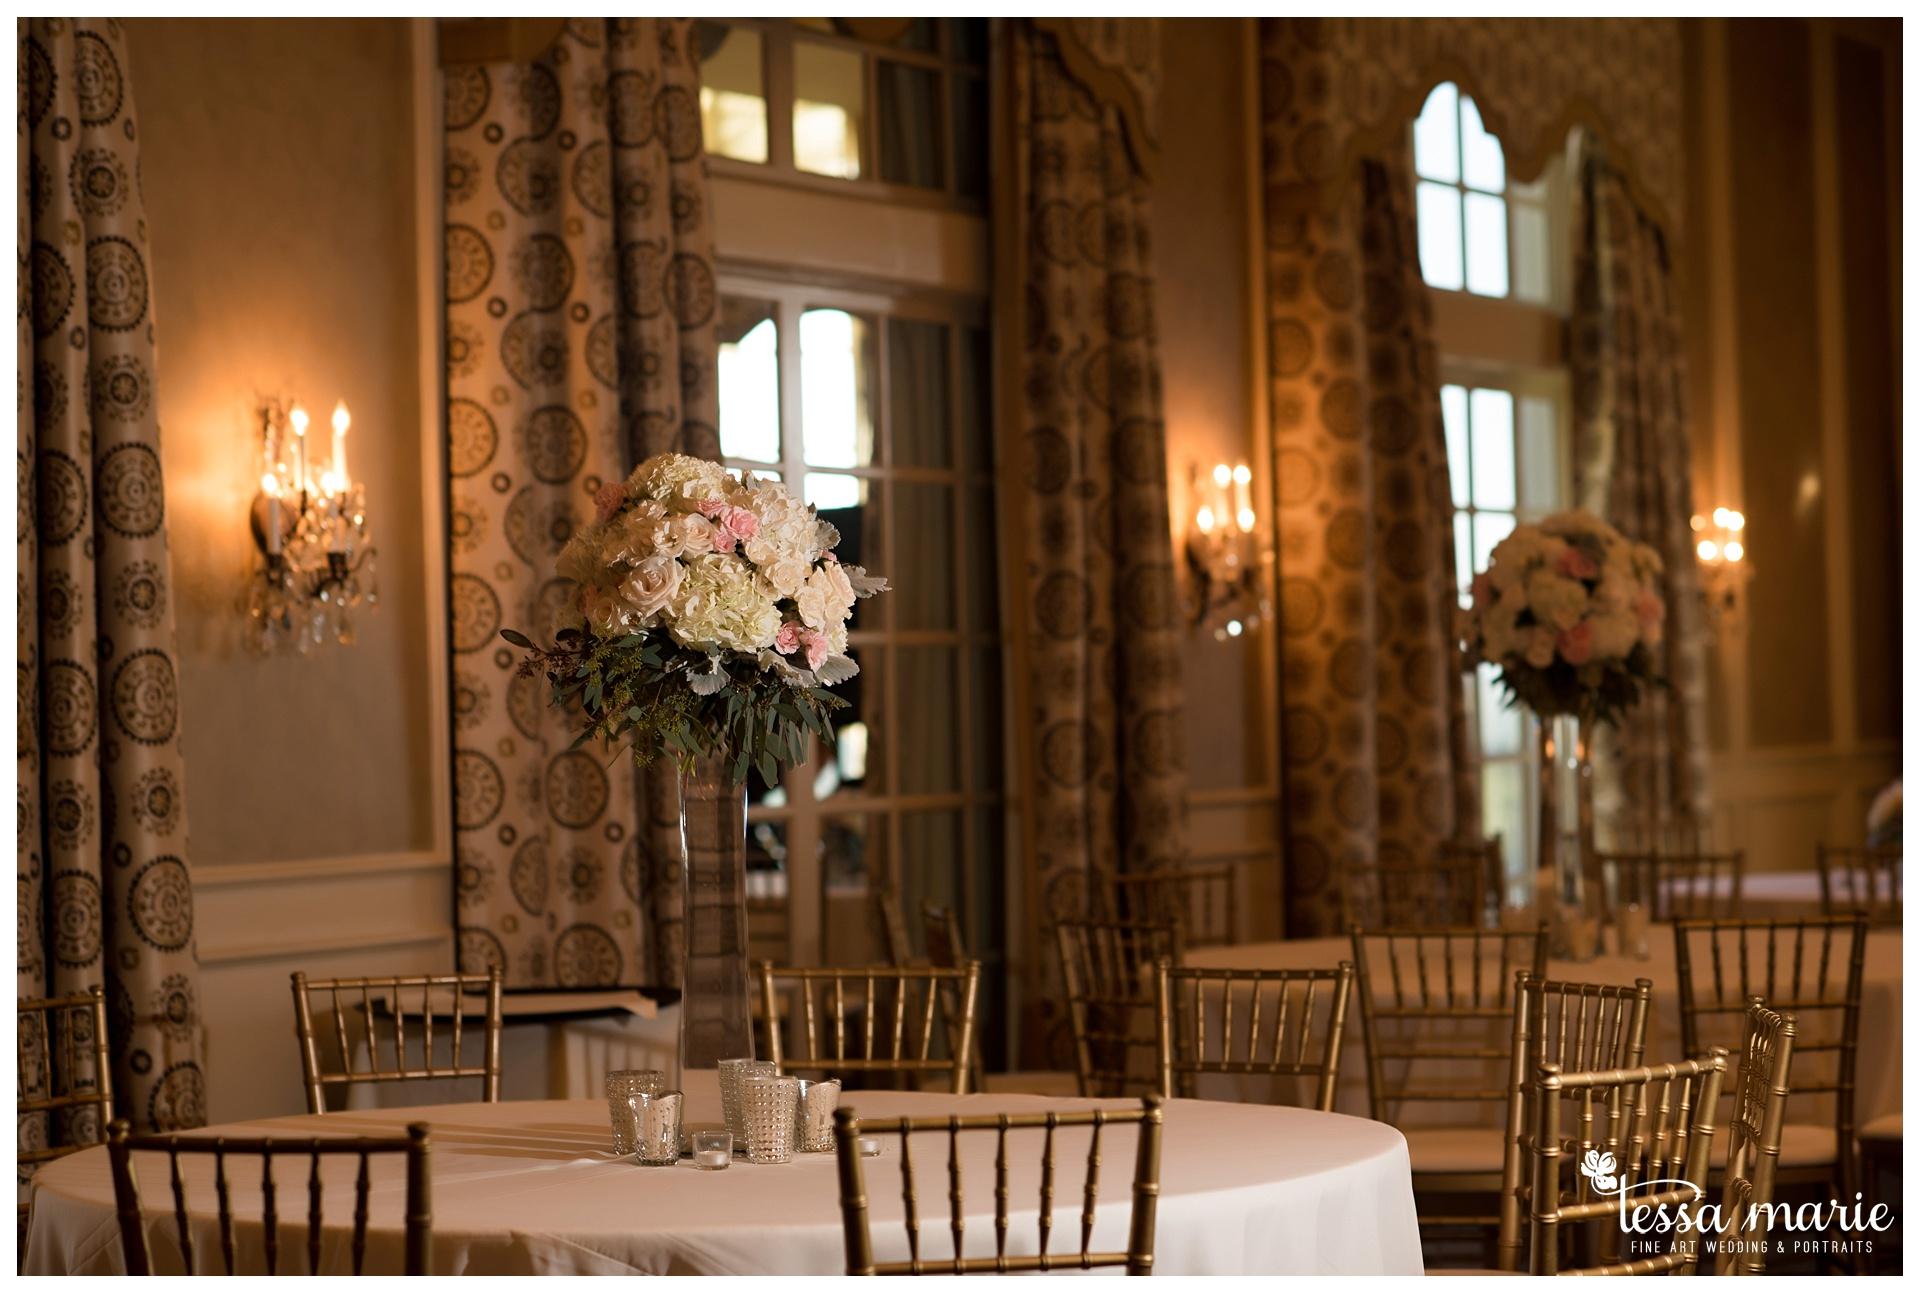 tessa_marie_weddings_legacy_story_focused_wedding_pictures_atlanta_wedding_photographer_0138